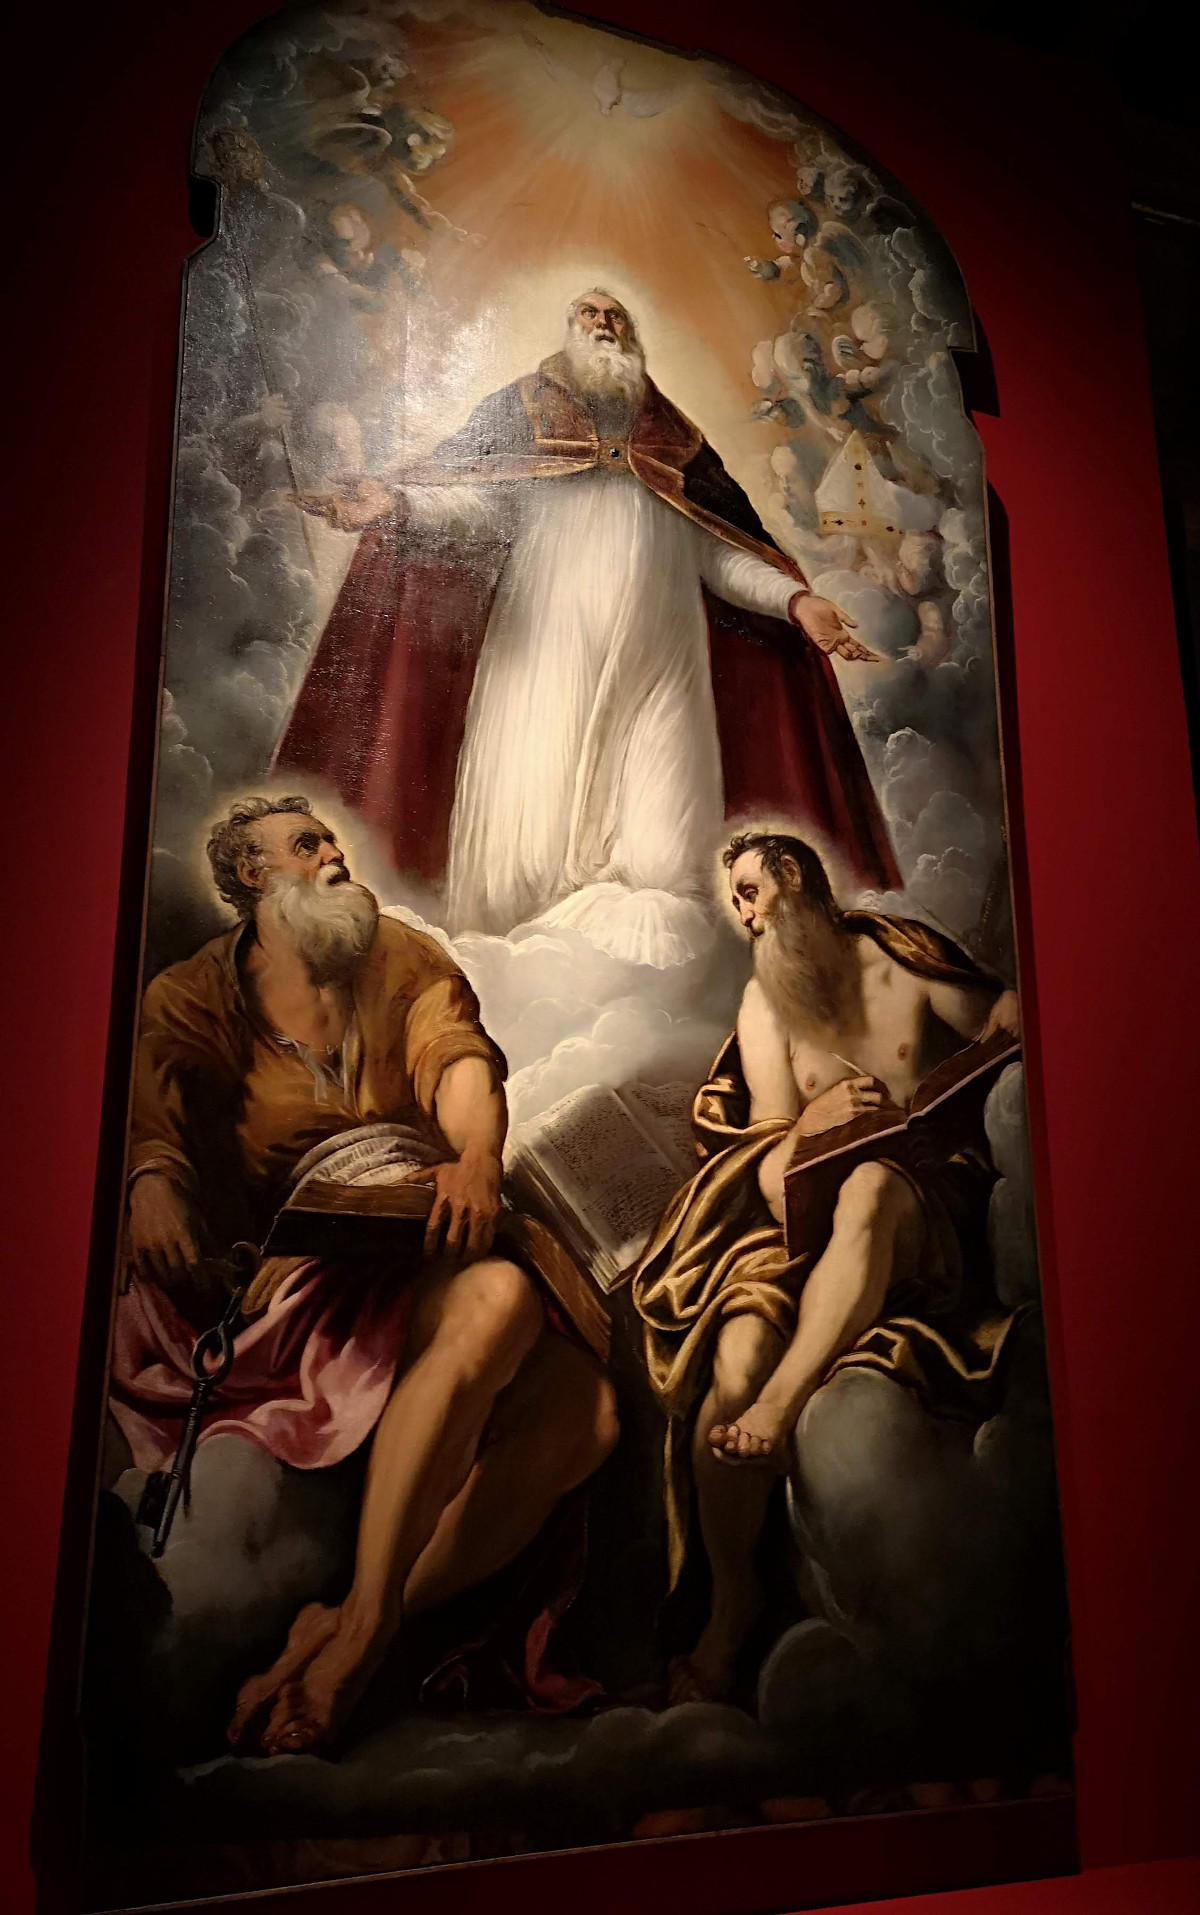 San Marziale in Gloria fra San Pietro e San Paolo - Jacopo Robusti, Tintoretto - Chiesa di San Marziale